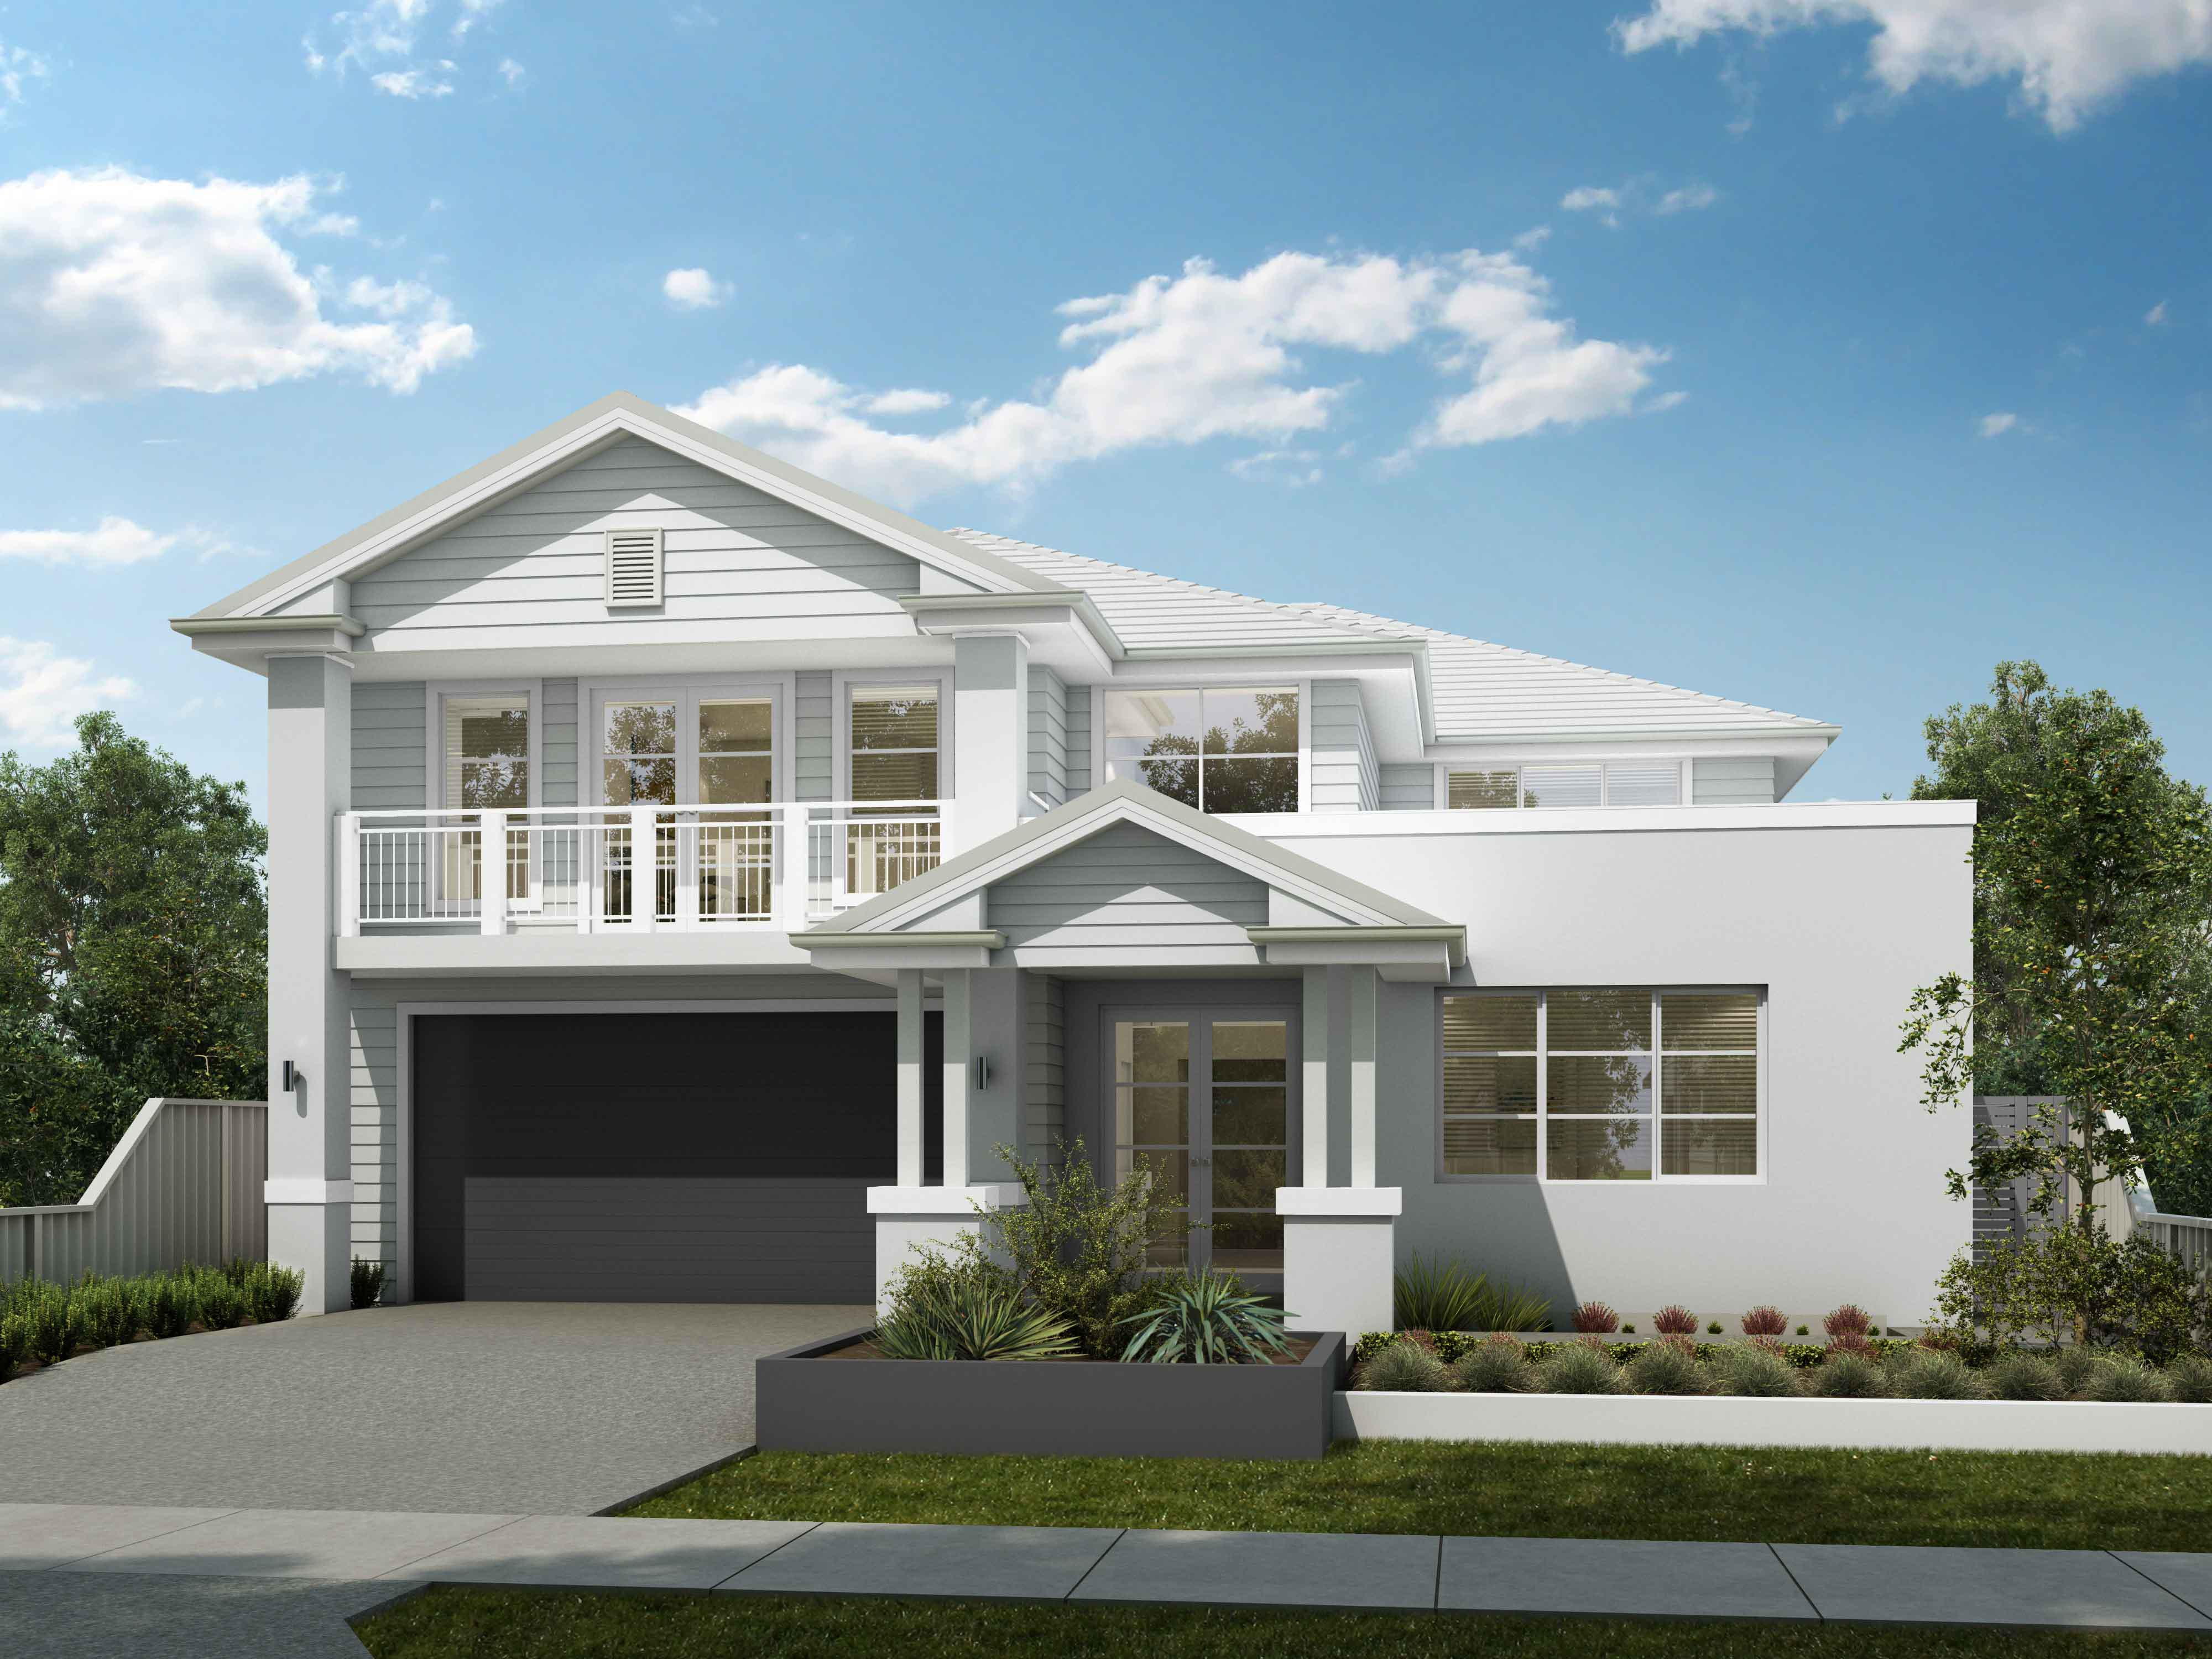 Hall & Hart Homes